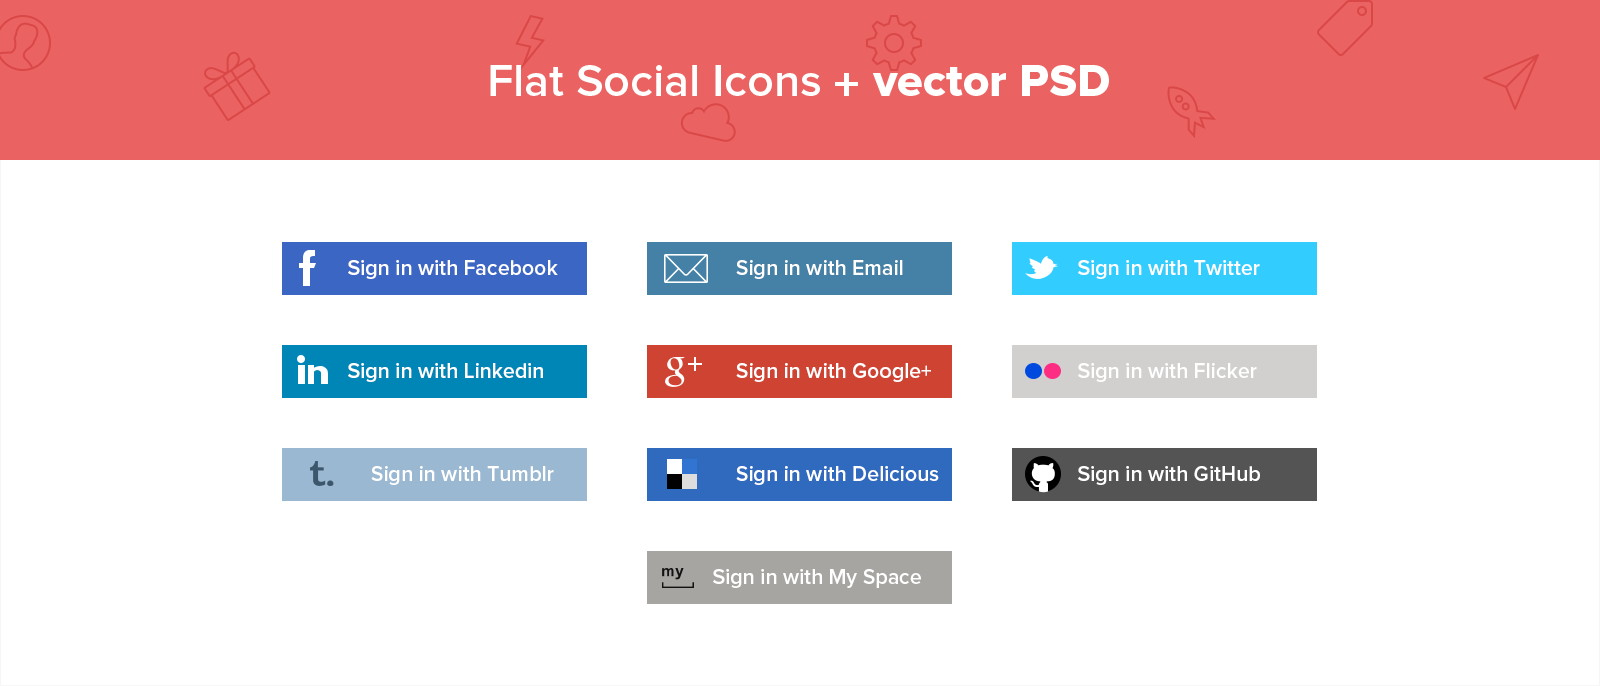 PSD - Flat Social media Icons + Vector PSD